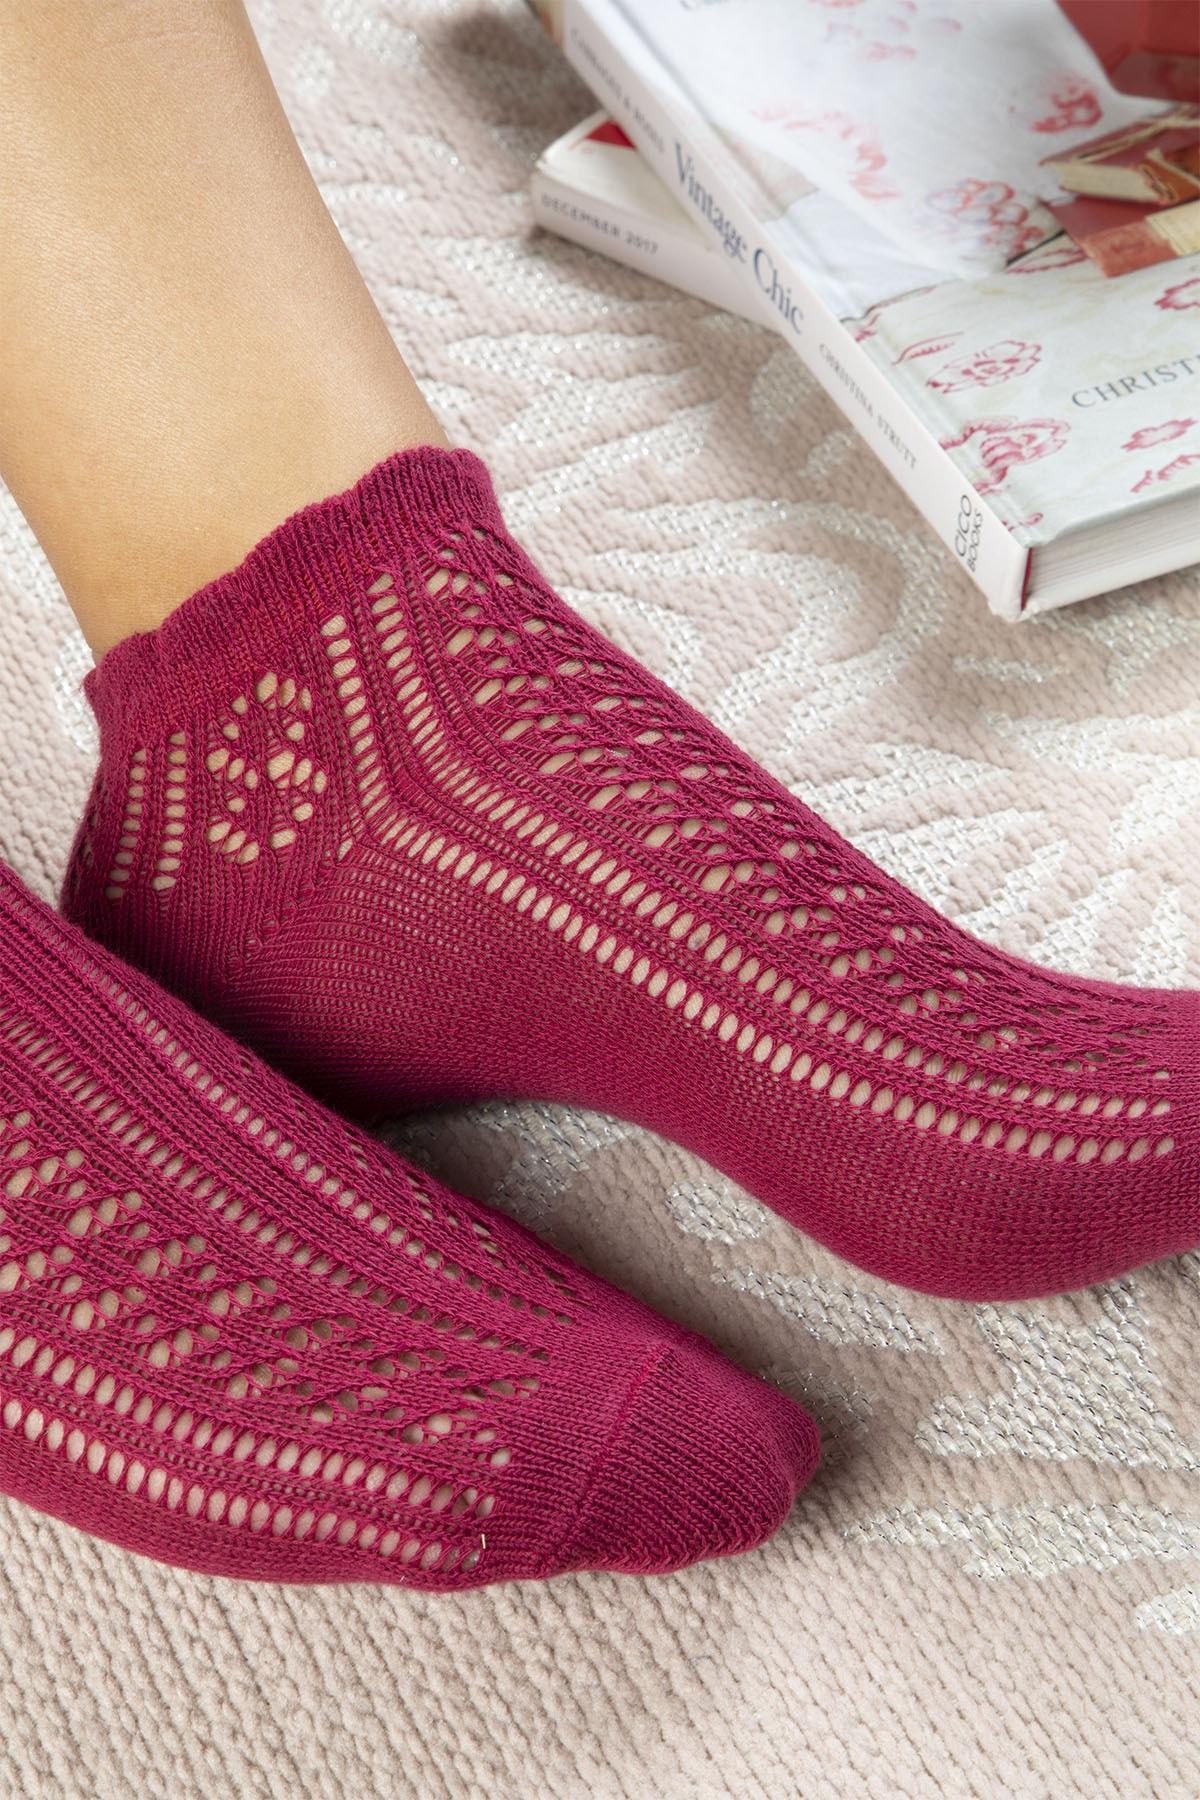 English Home Fishnet Pamuk Kadın Çorap Standart Bordo 2